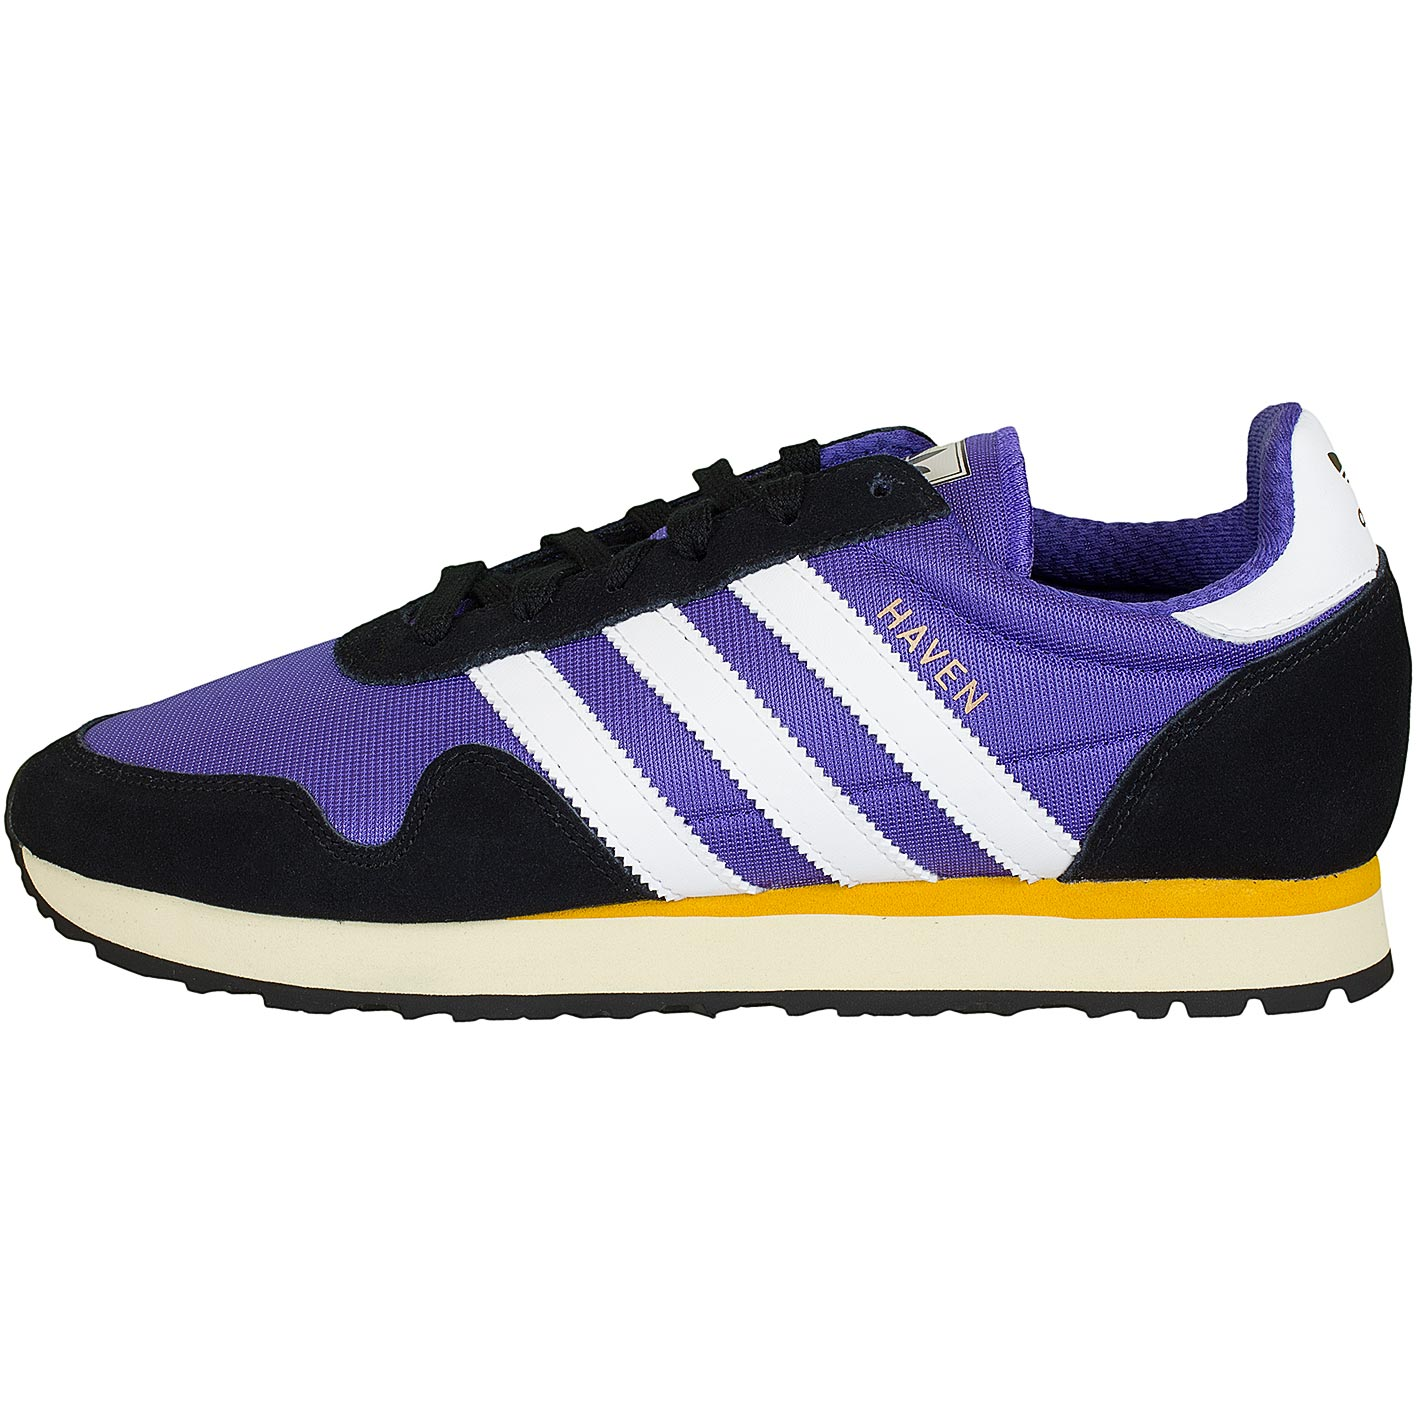 ☆ Adidas Originals Sneaker Haven lilaweißschwarz hier